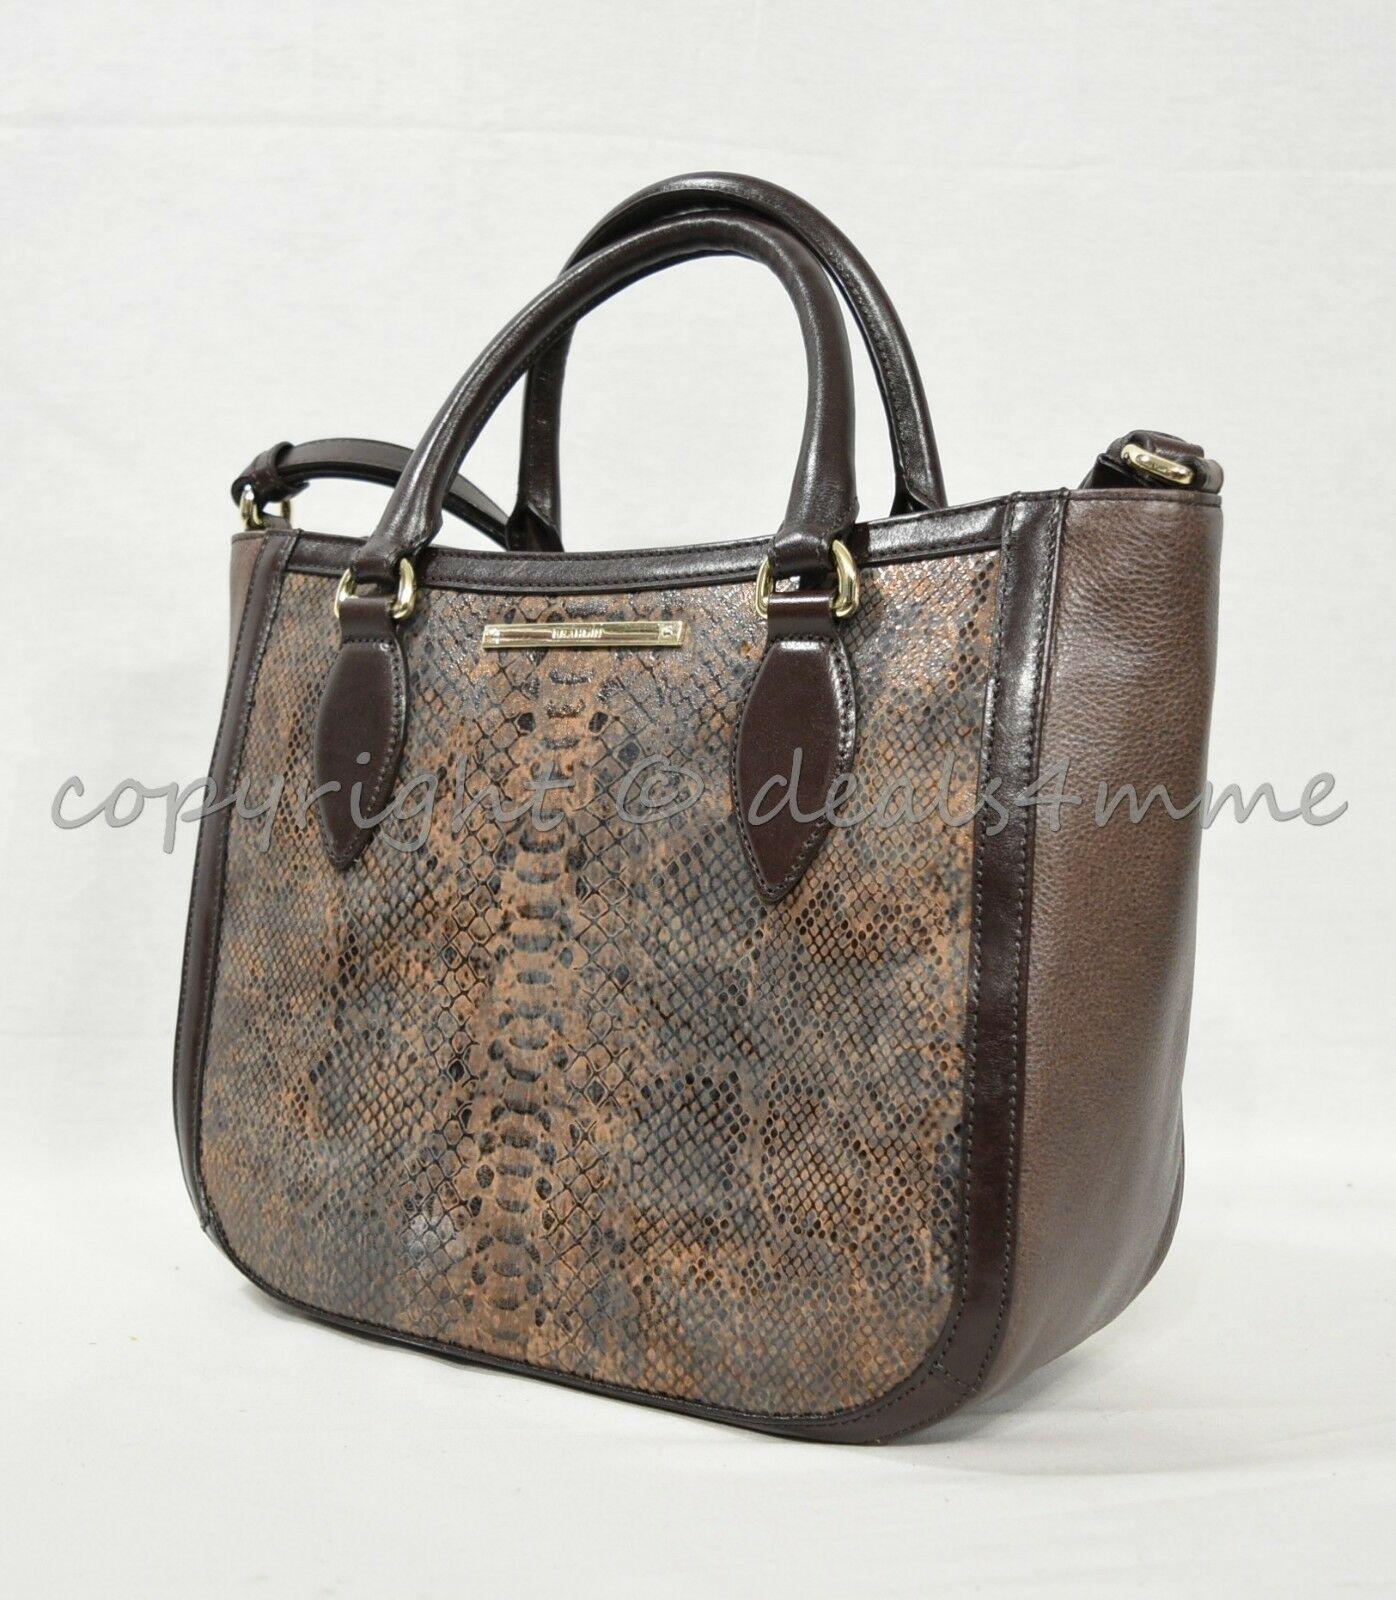 NWT Brahmin Small Lena Leather Satchel/Shoulder Bag in Brown Barrow